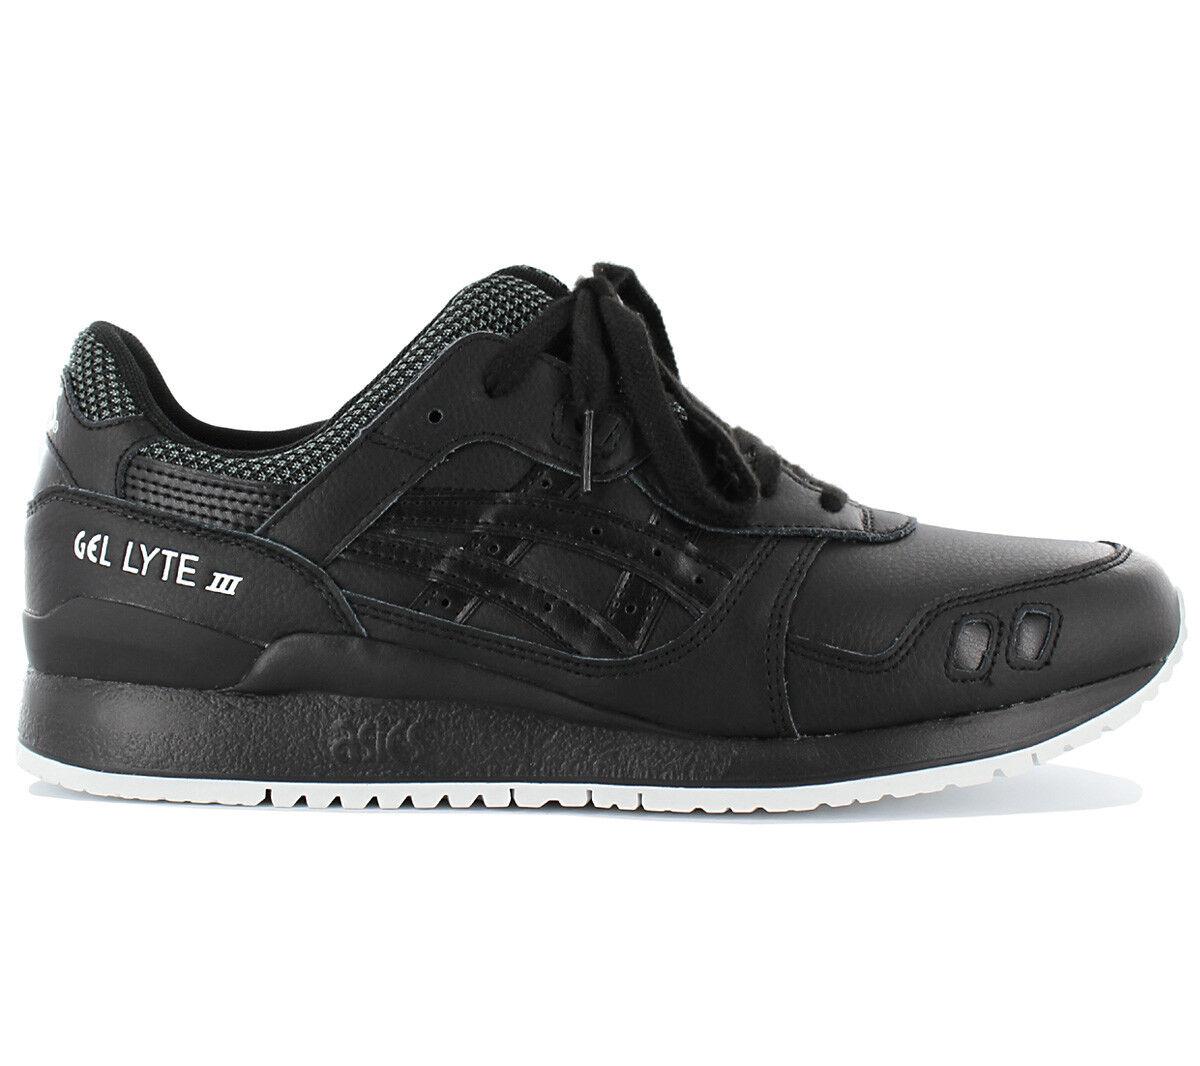 Asics Tiger Gel-Lyte III Herren Sneaker Schuhe Leder Schwarz Freizeit HL701-9090